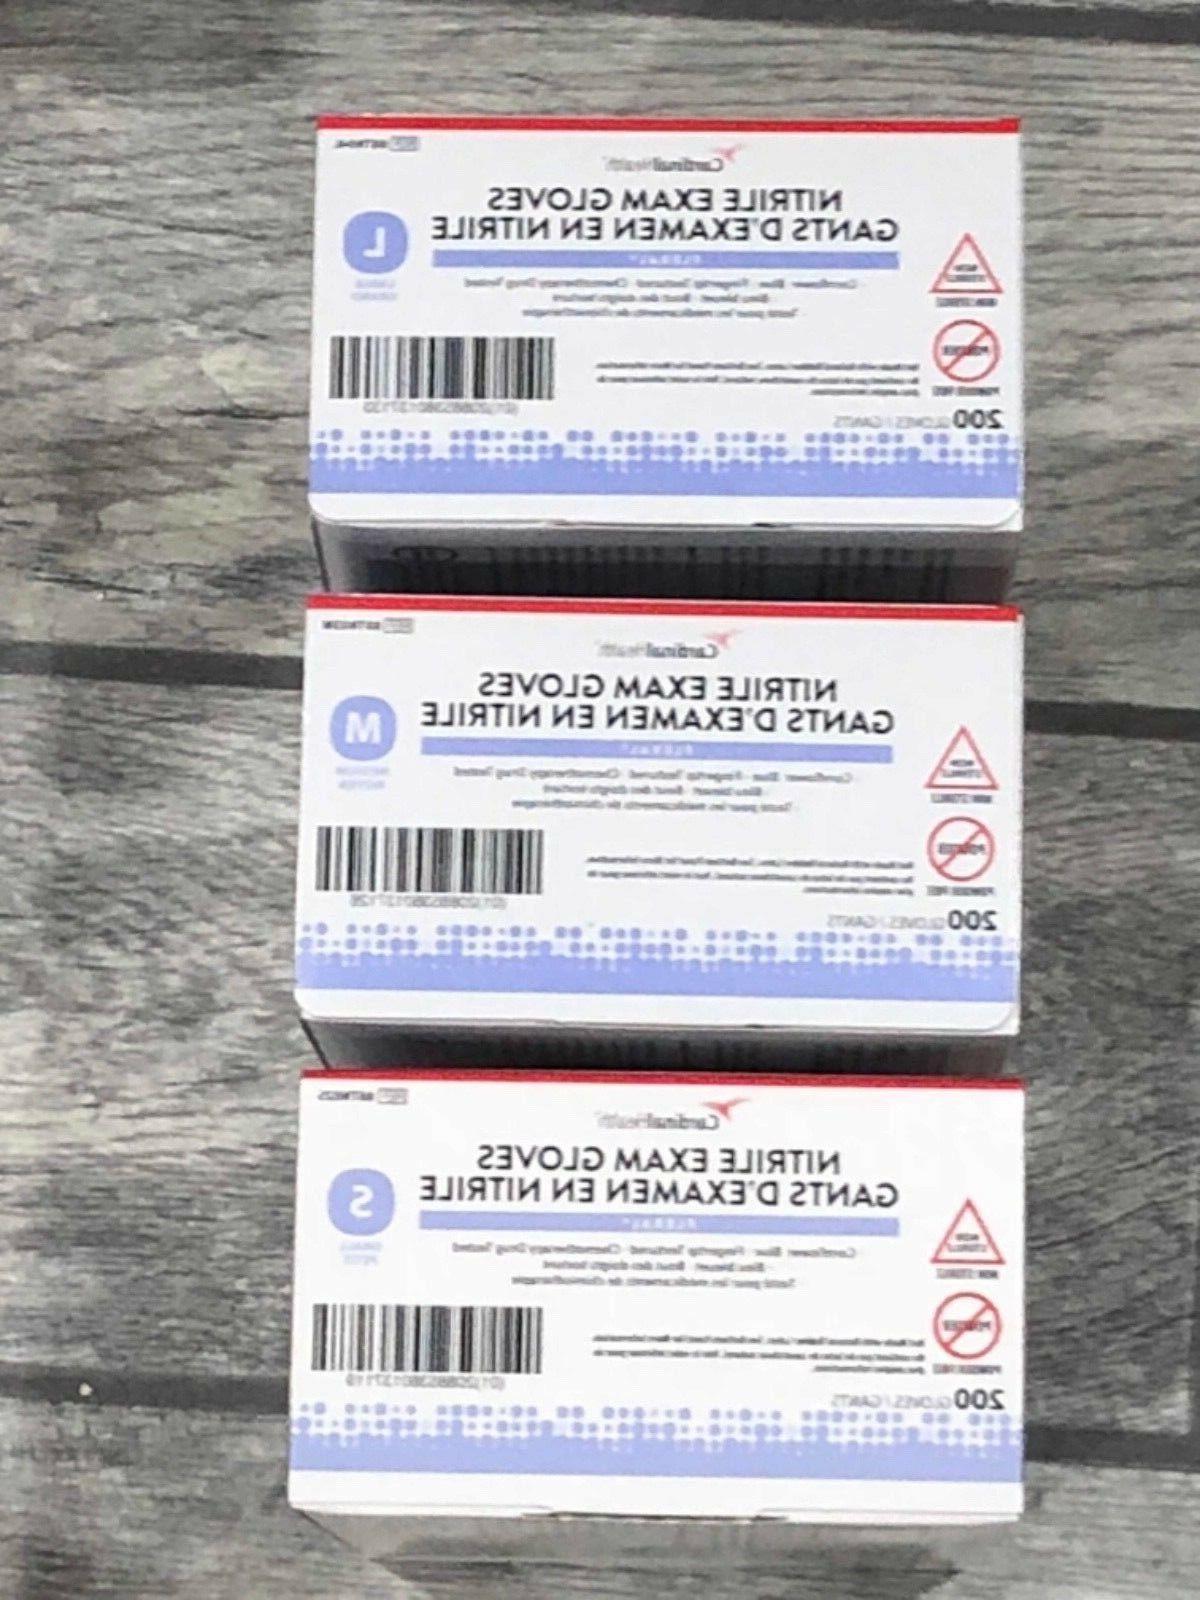 2000 Cardinal Health Nitrile Disposable Exam Gloves Free